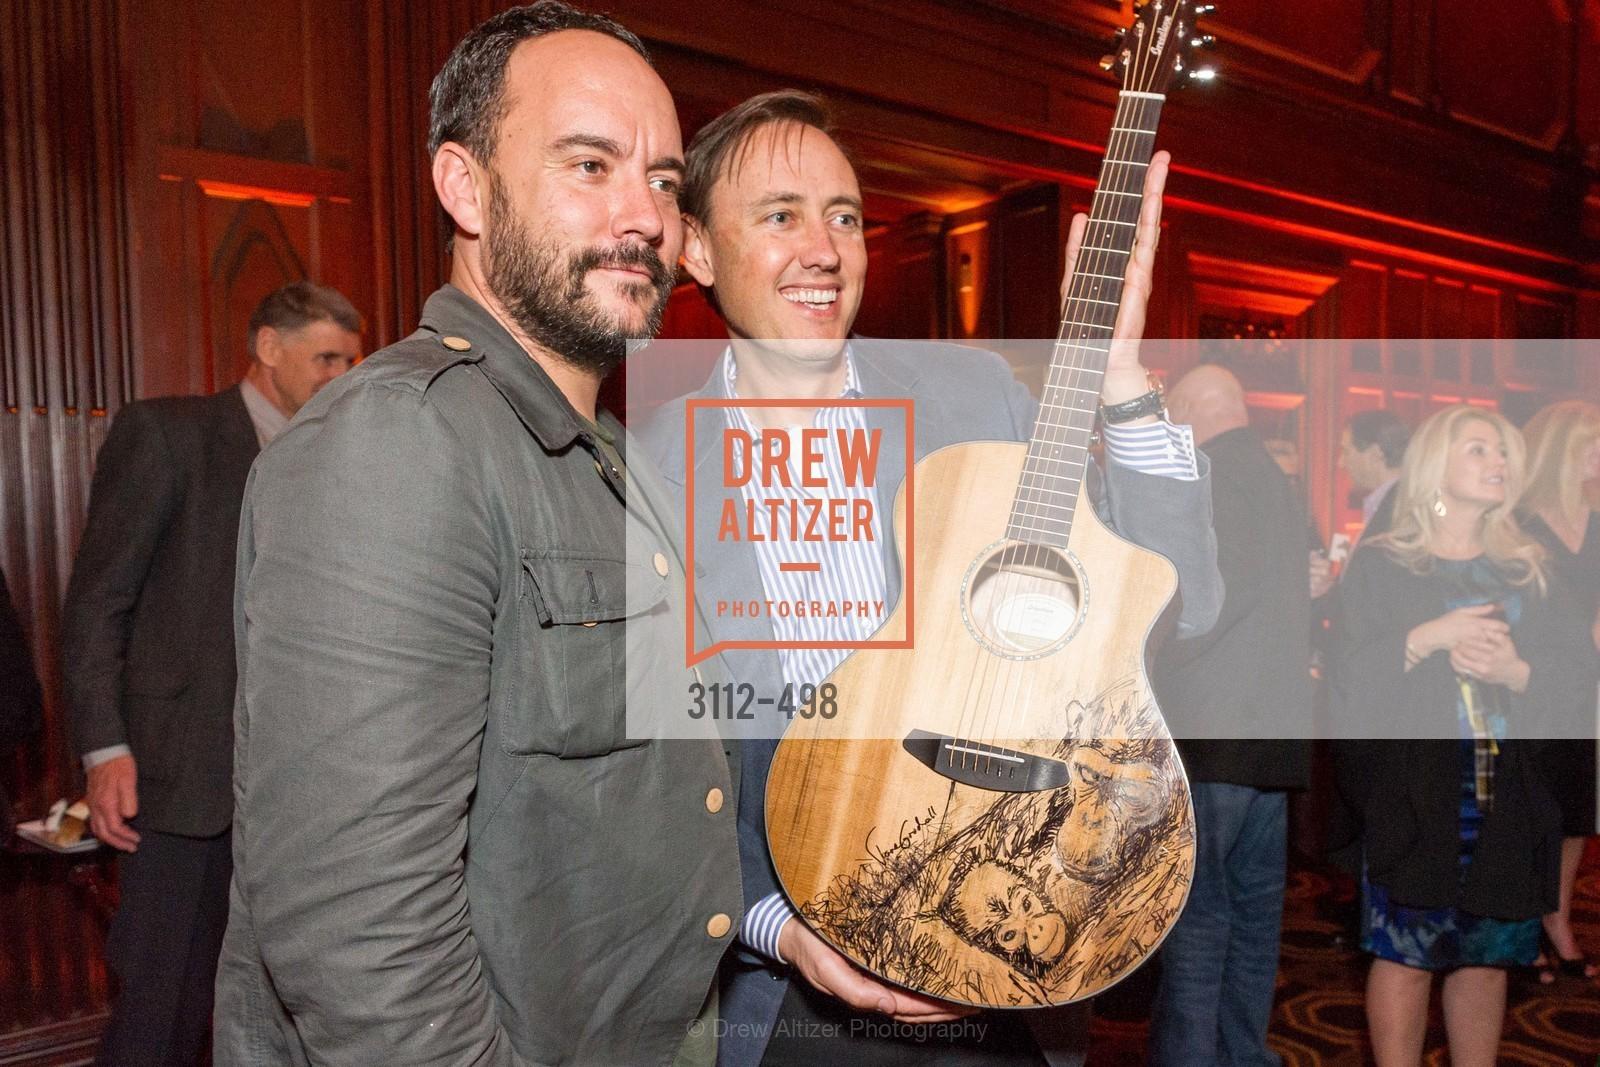 Dave Matthews, Steve Jurvetson, Photo #3112-498